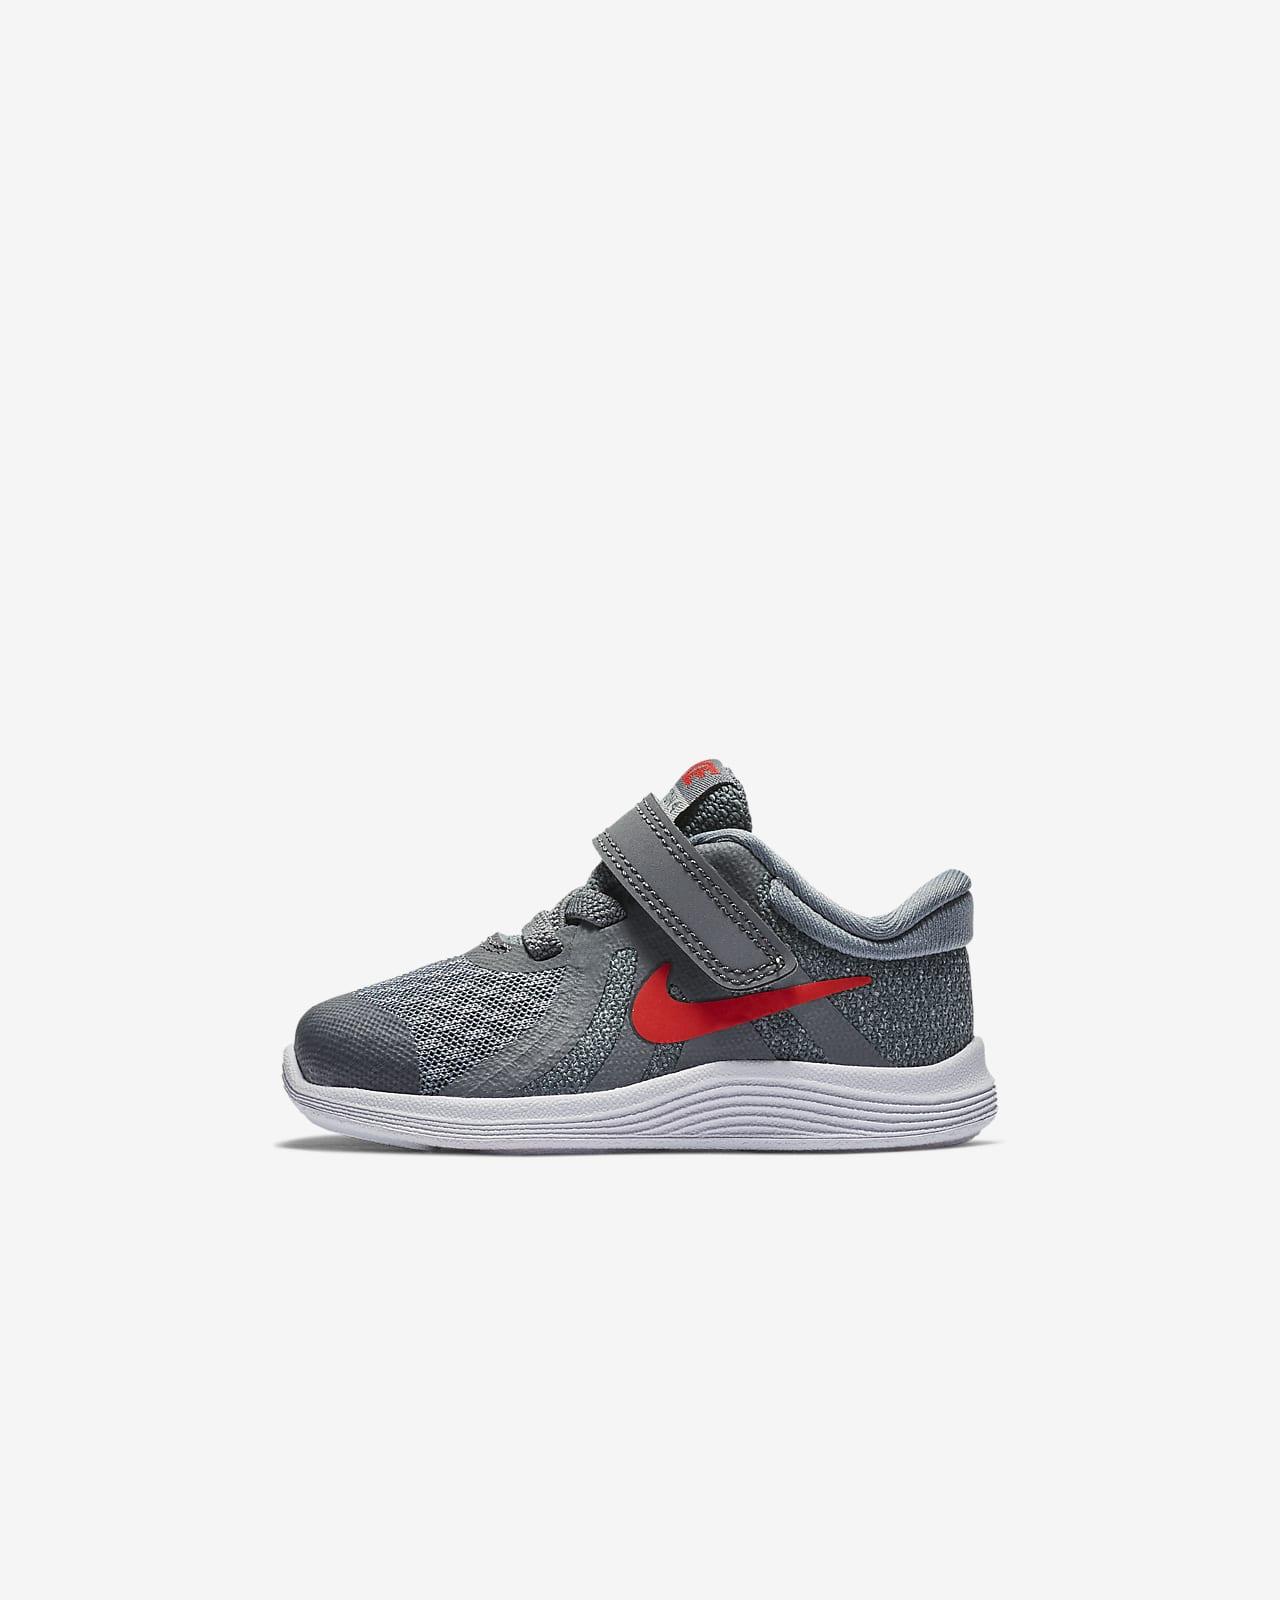 Bota Nike Revolution 4 pro kojence abatolata